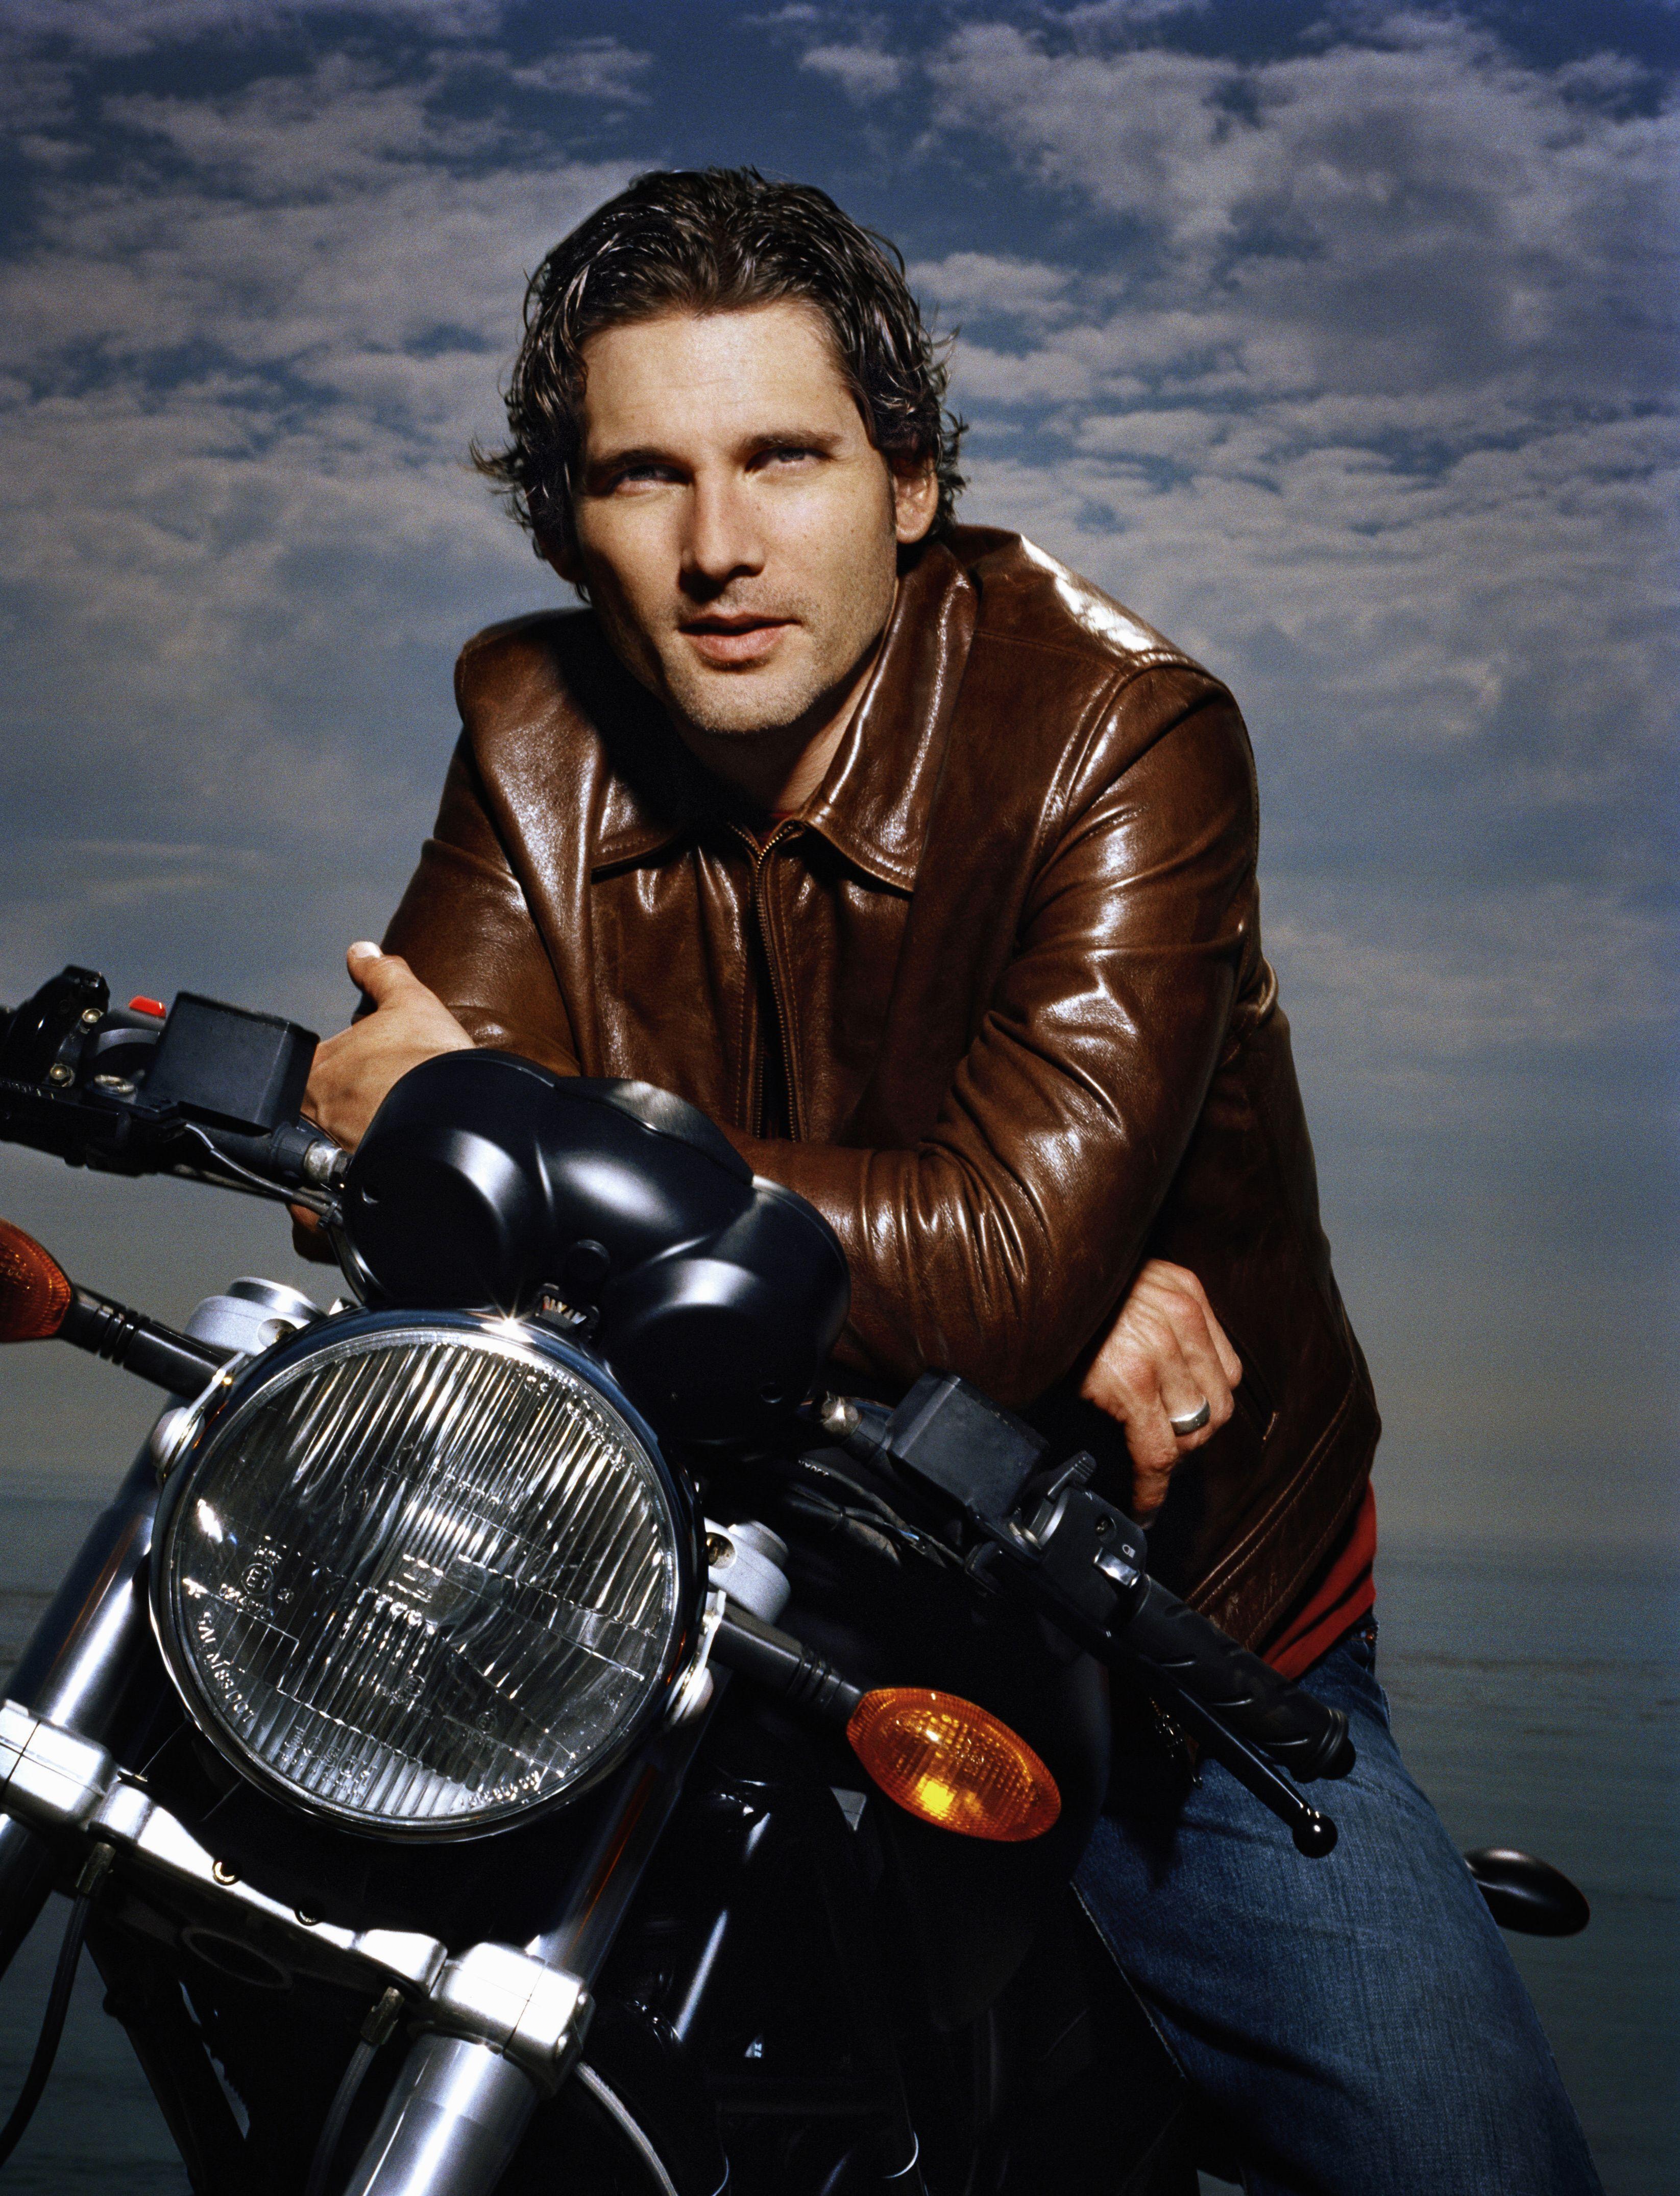 Картинки мужчин с мотоциклами загрузить